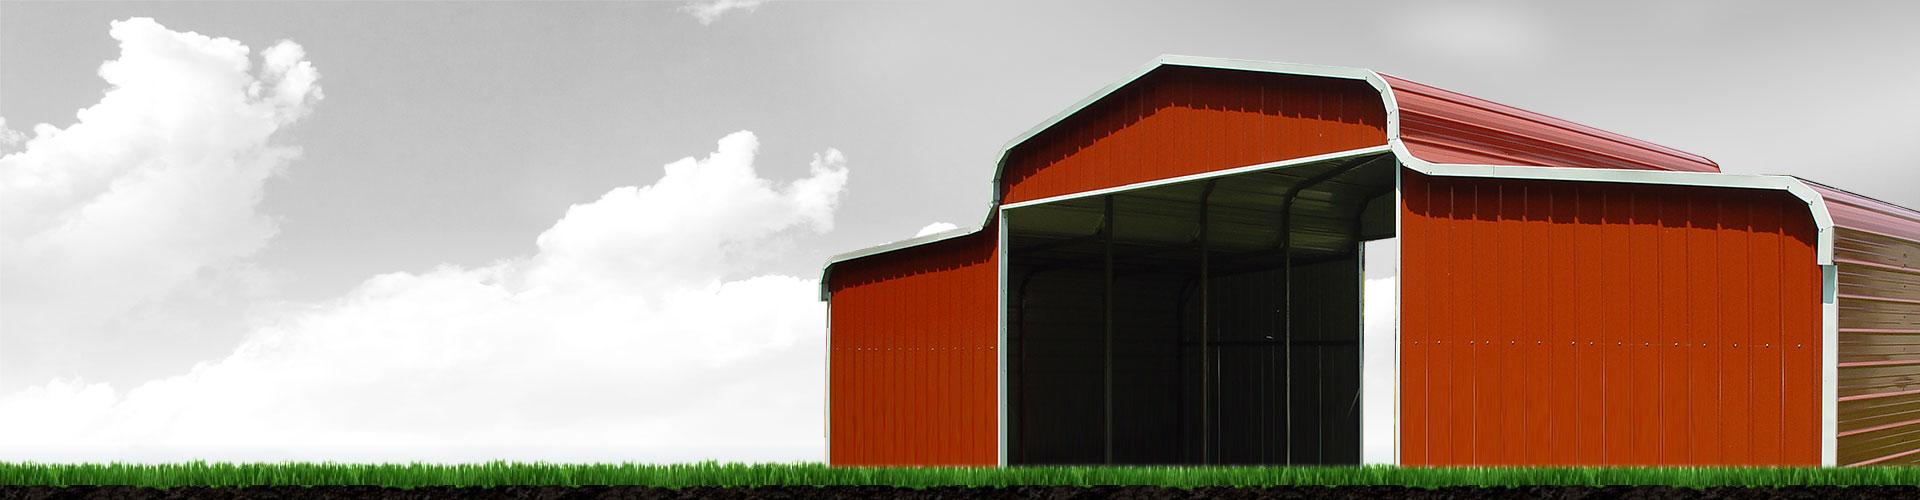 Build Your Barn Slide Background